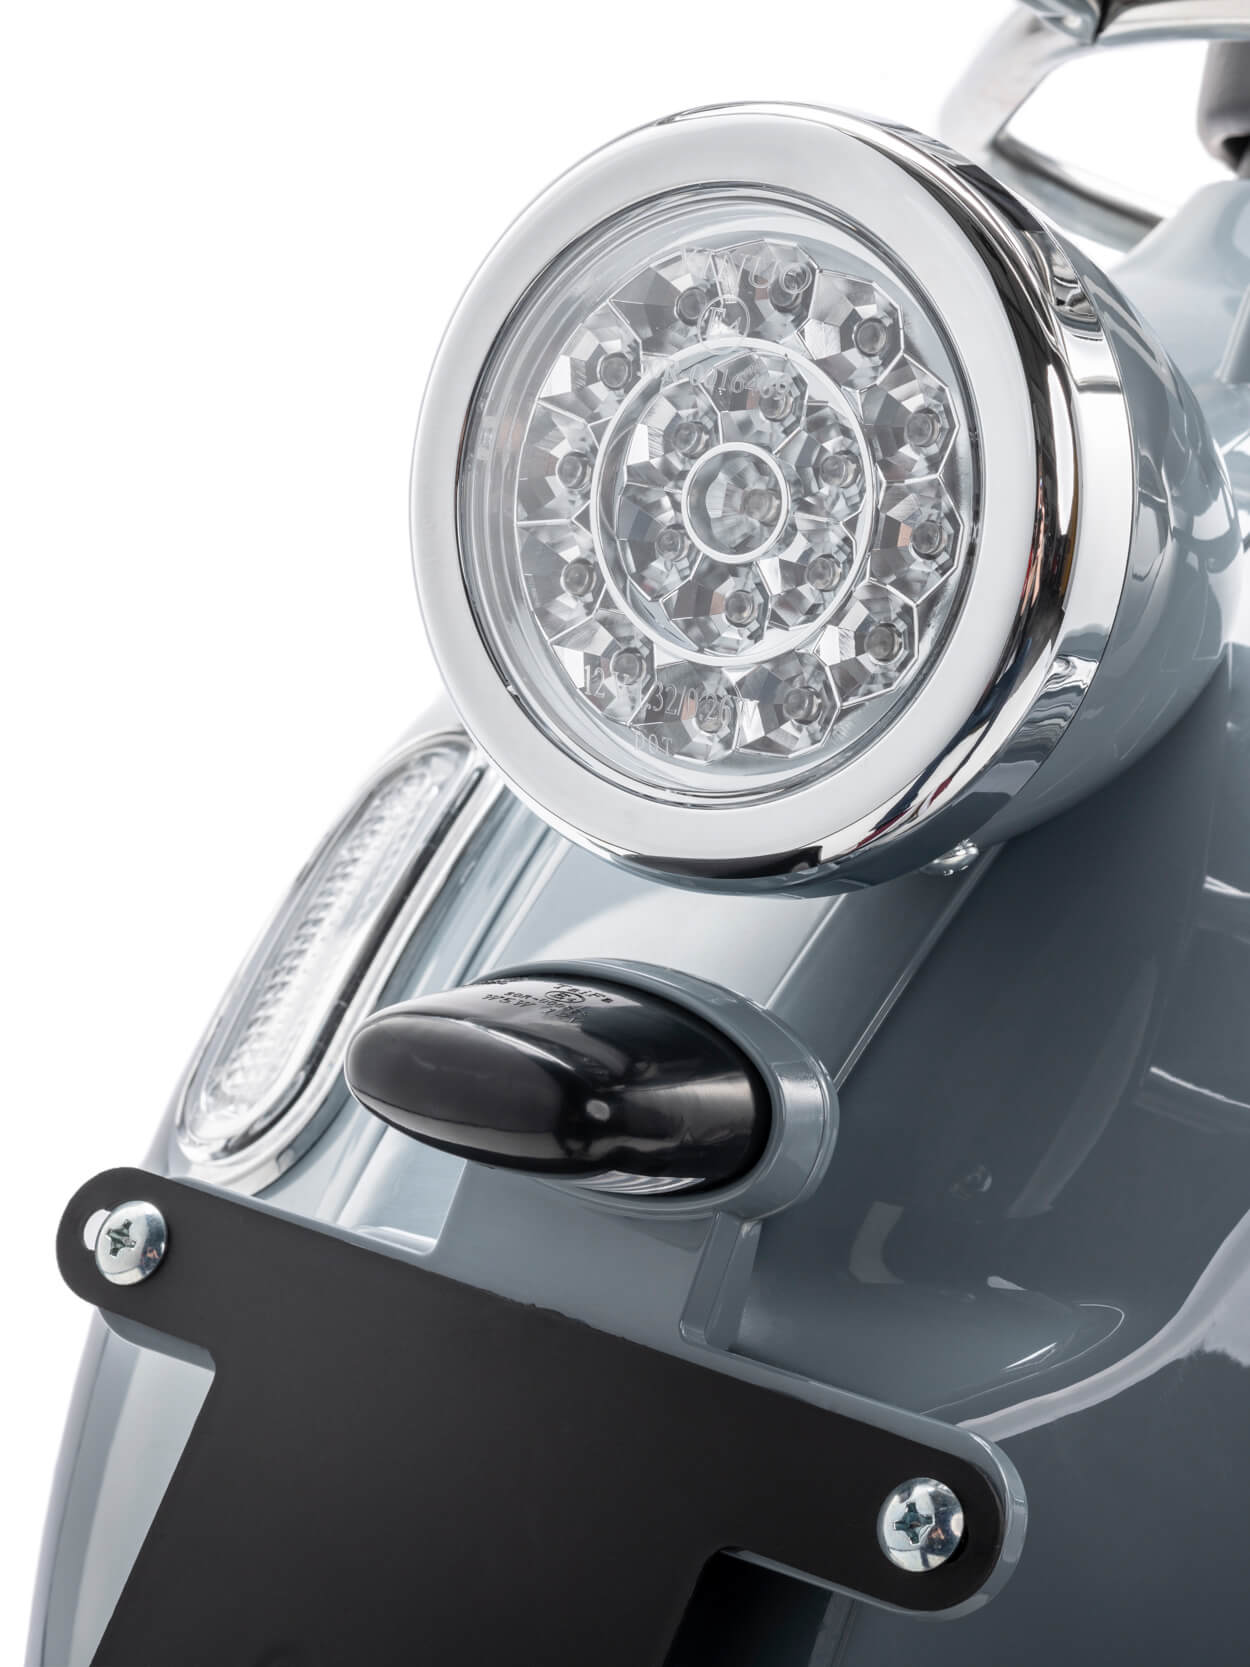 elektroroller-e-scooter-nova-ruecklicht